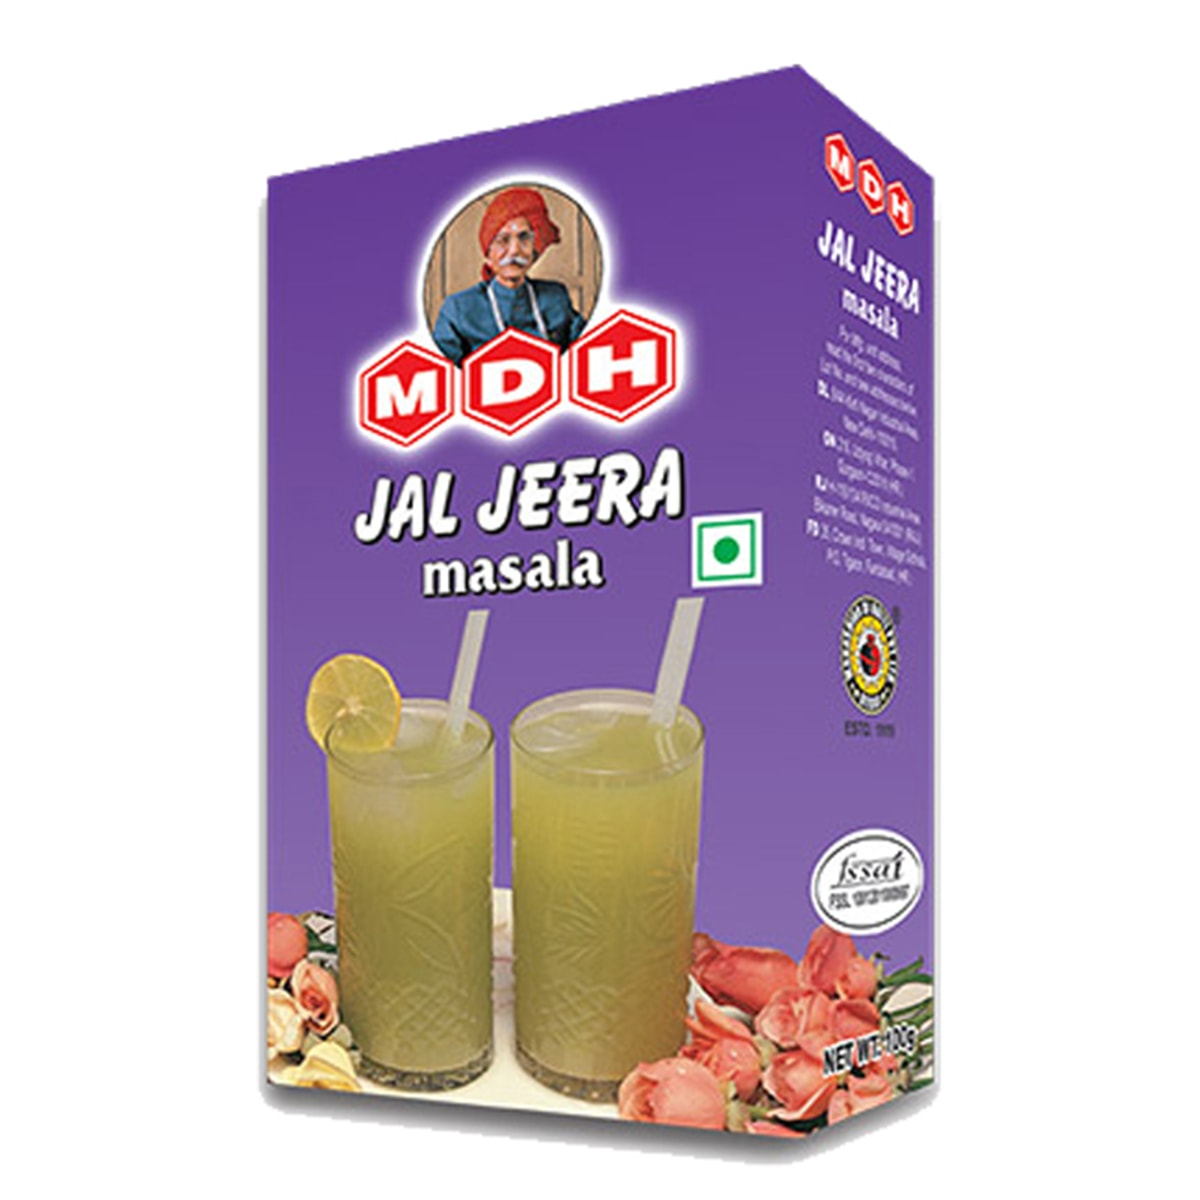 Buy MDH Jal Jeera Masala - 100 gm